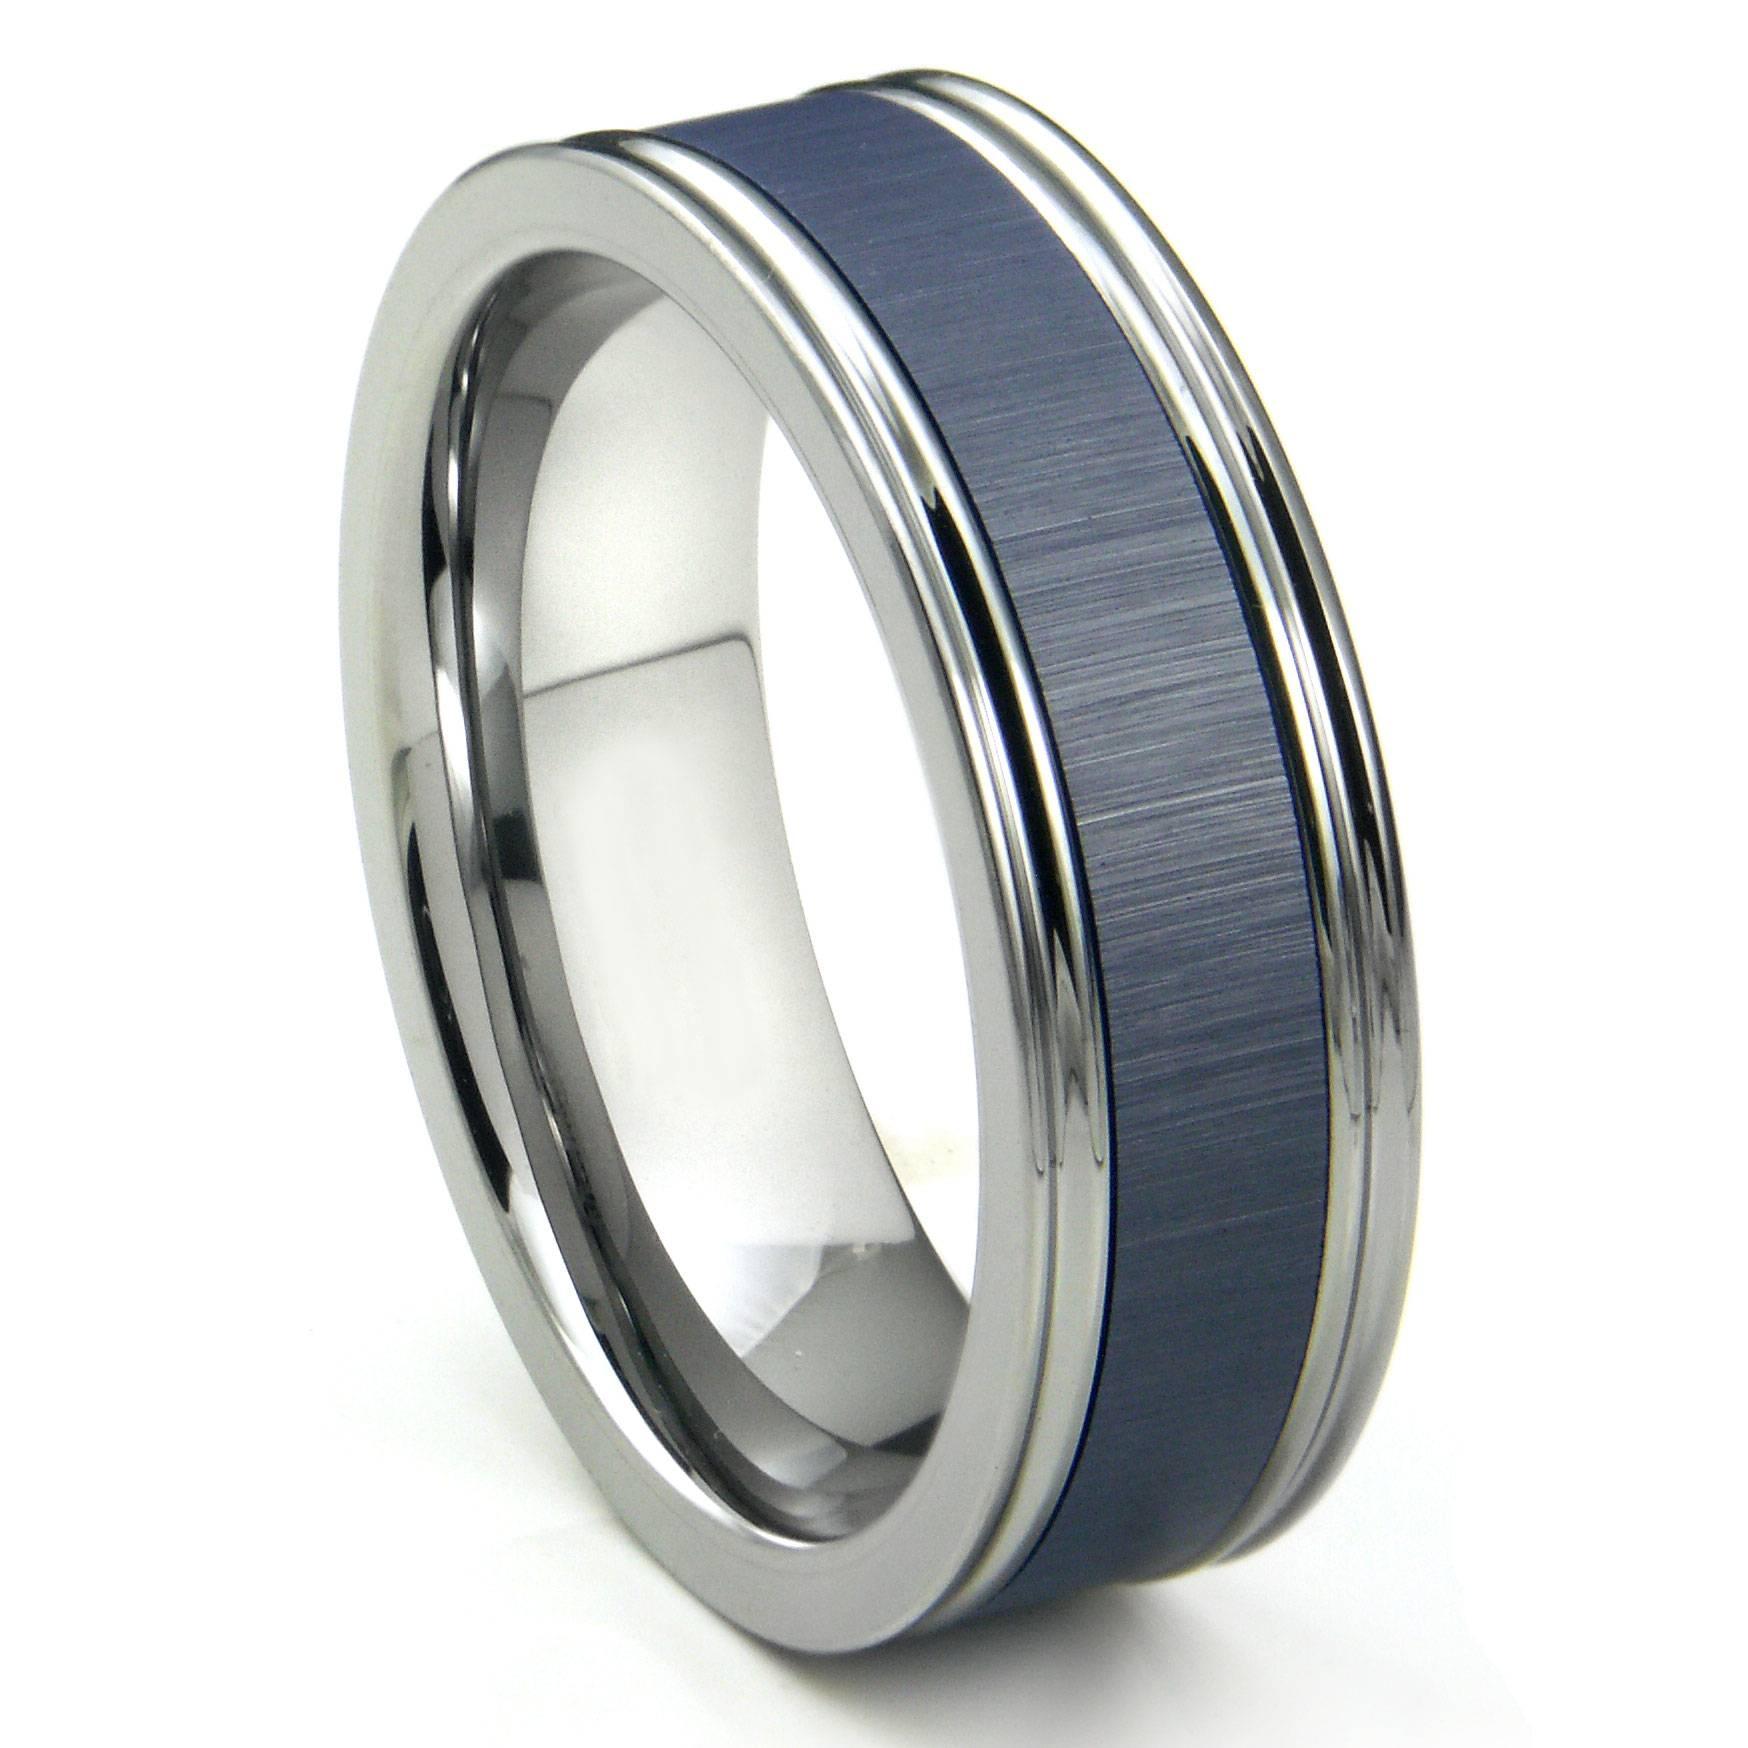 Wedding Rings : Ceramic Wedding Band Vs Tungsten Ceramic Wedding Inside Ceramic Wedding Bands (View 8 of 15)